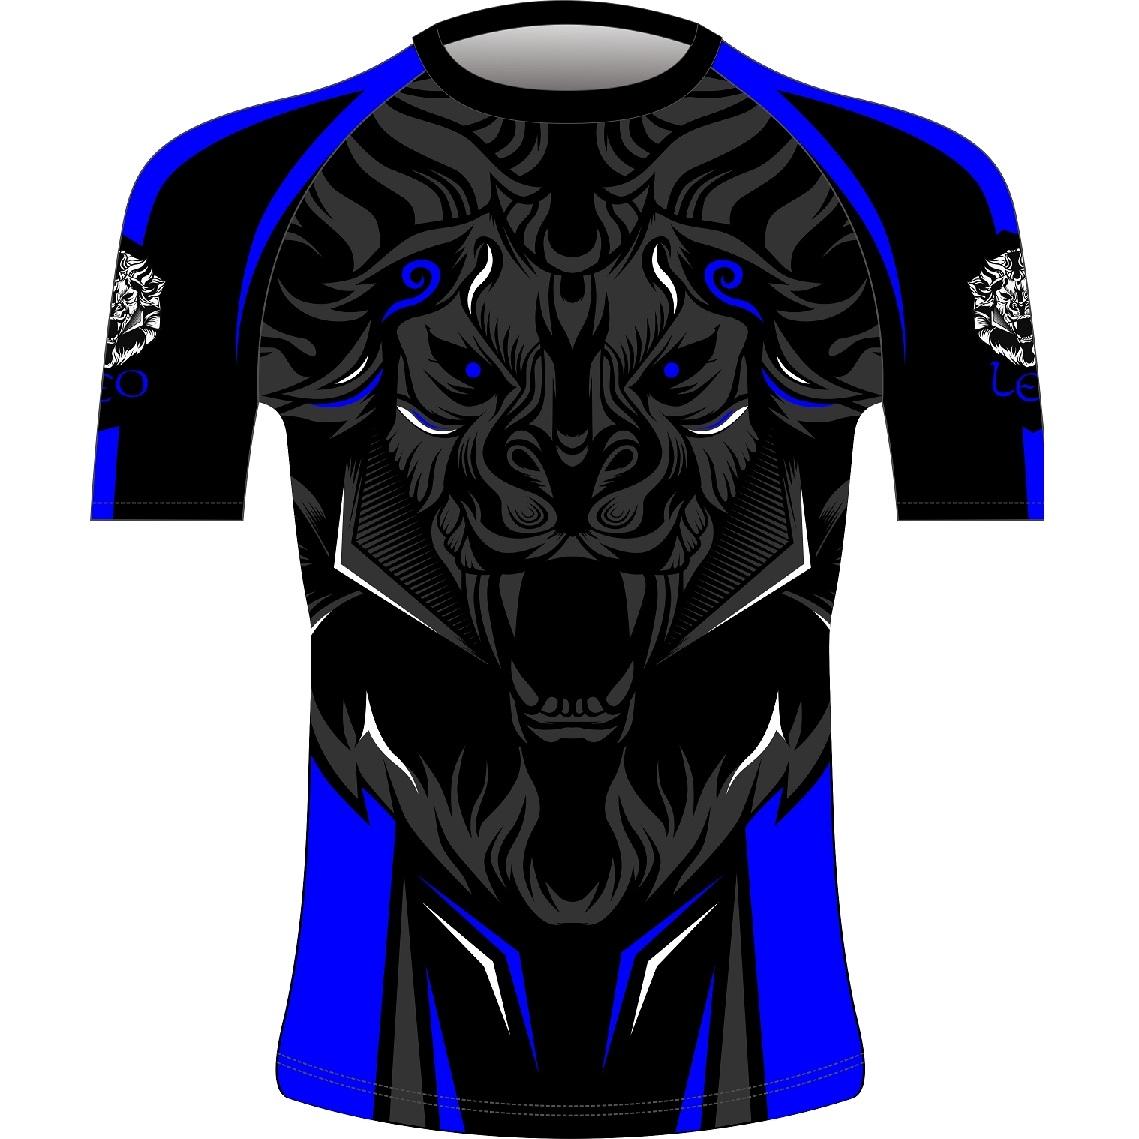 Leo ROAR Rashguard SS - Black/Blue